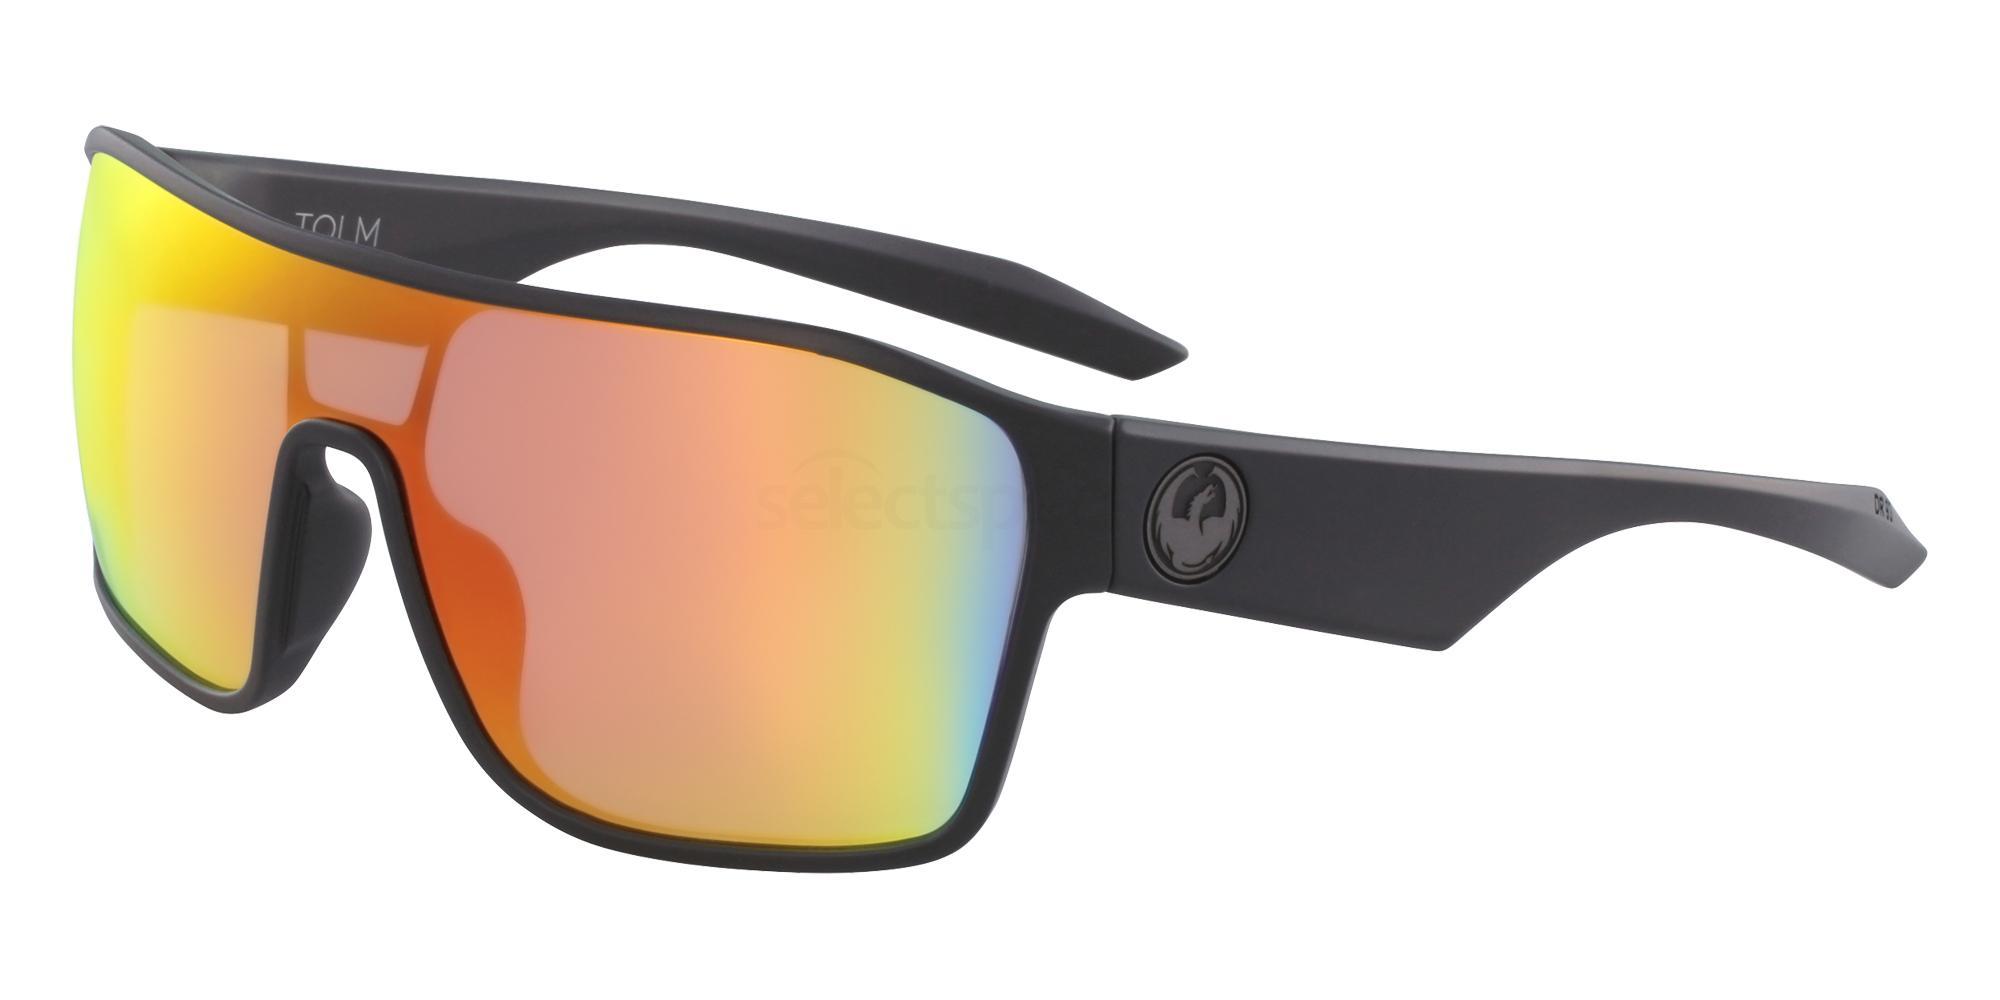 022 DR TOLM ION Sunglasses, Dragon